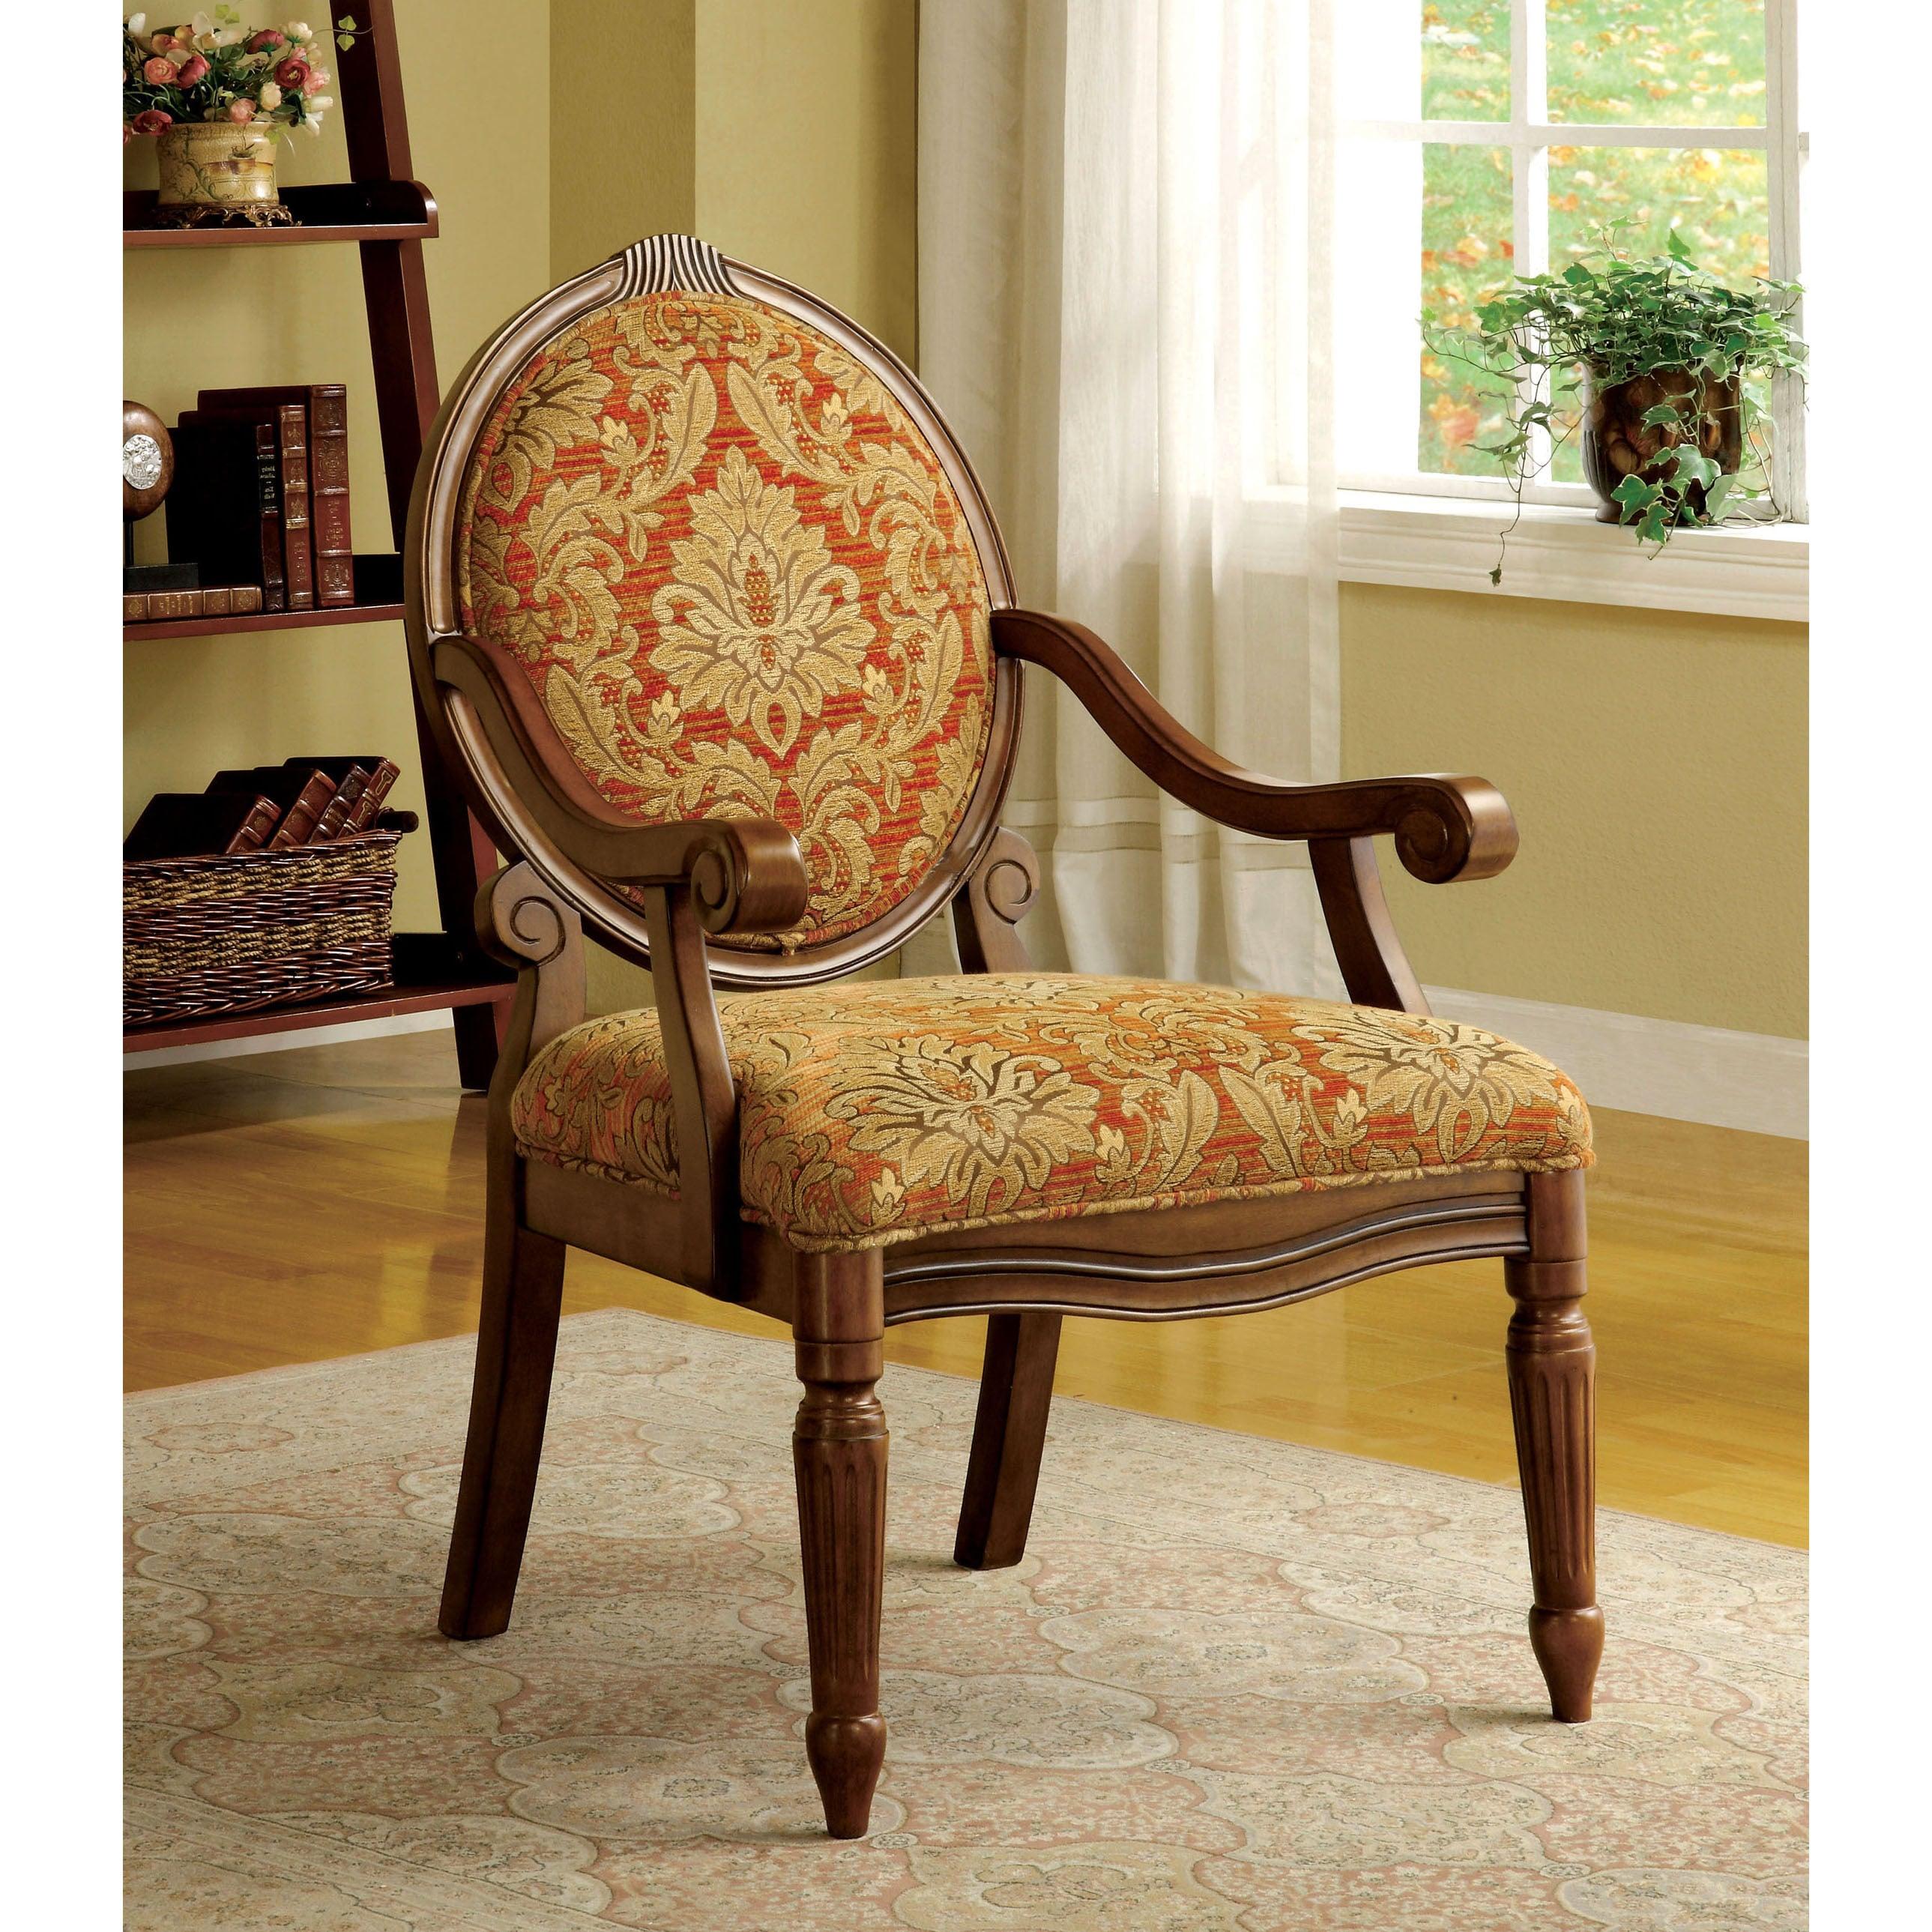 Enjoyable Letitia Victorian Style Antique Oak Accent Chair By Foa Creativecarmelina Interior Chair Design Creativecarmelinacom